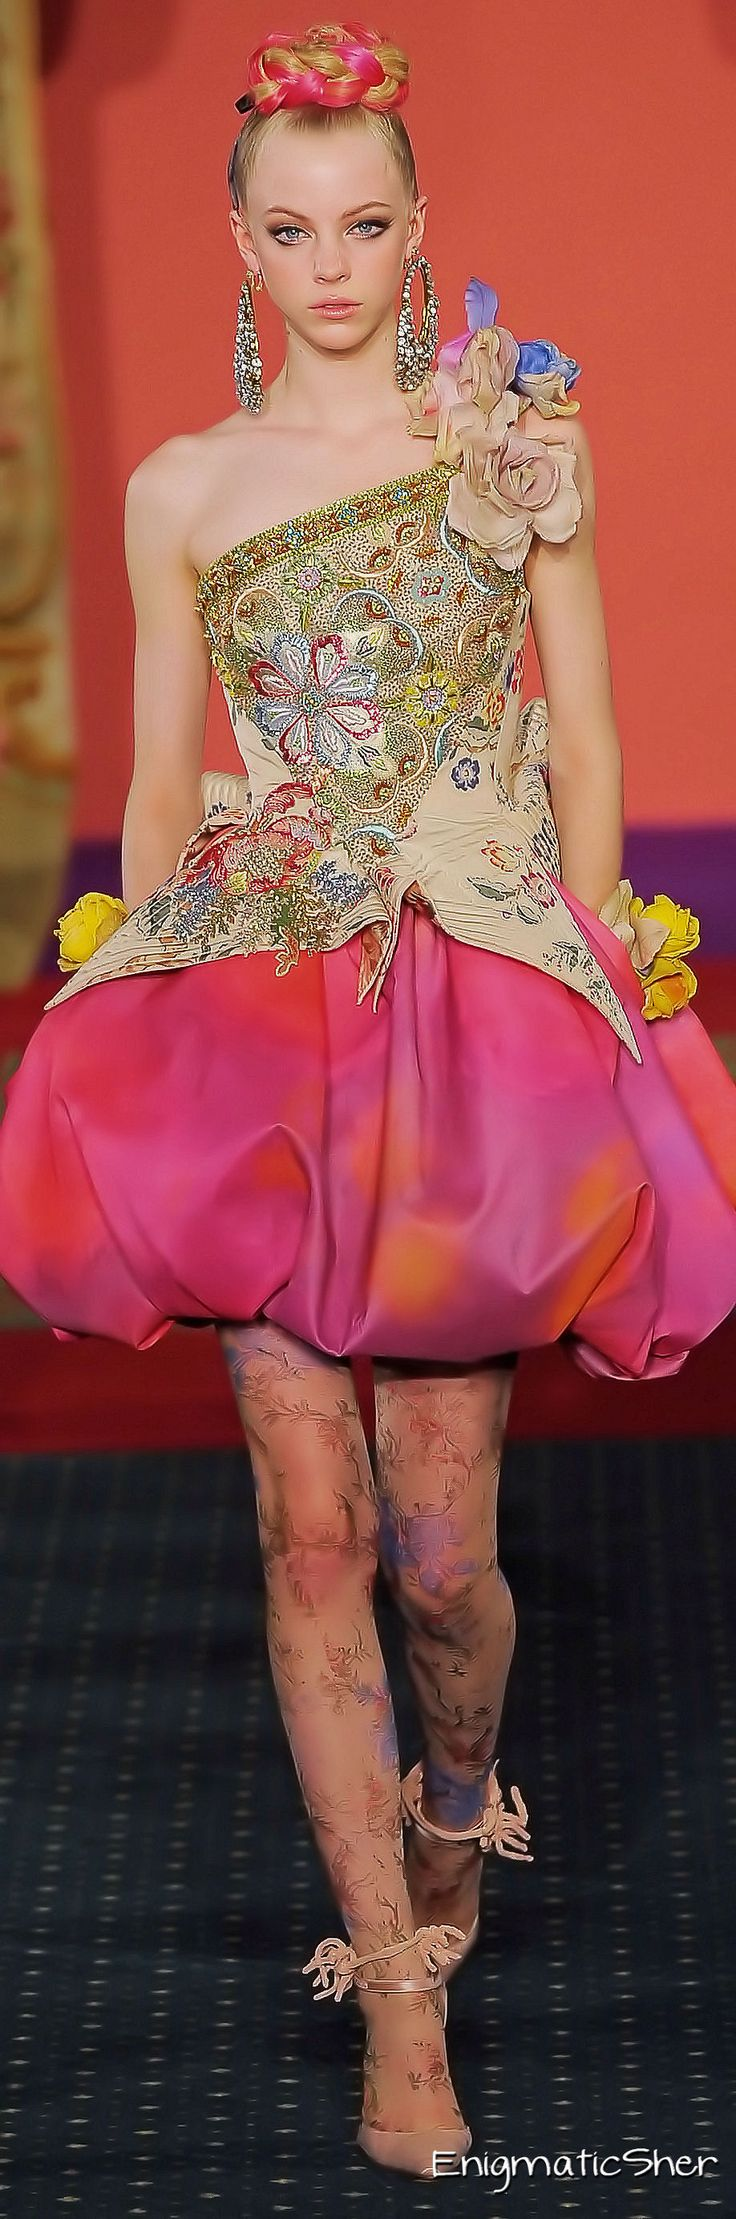 Christian Lacroix Spring Summer 2009 Haute Couture